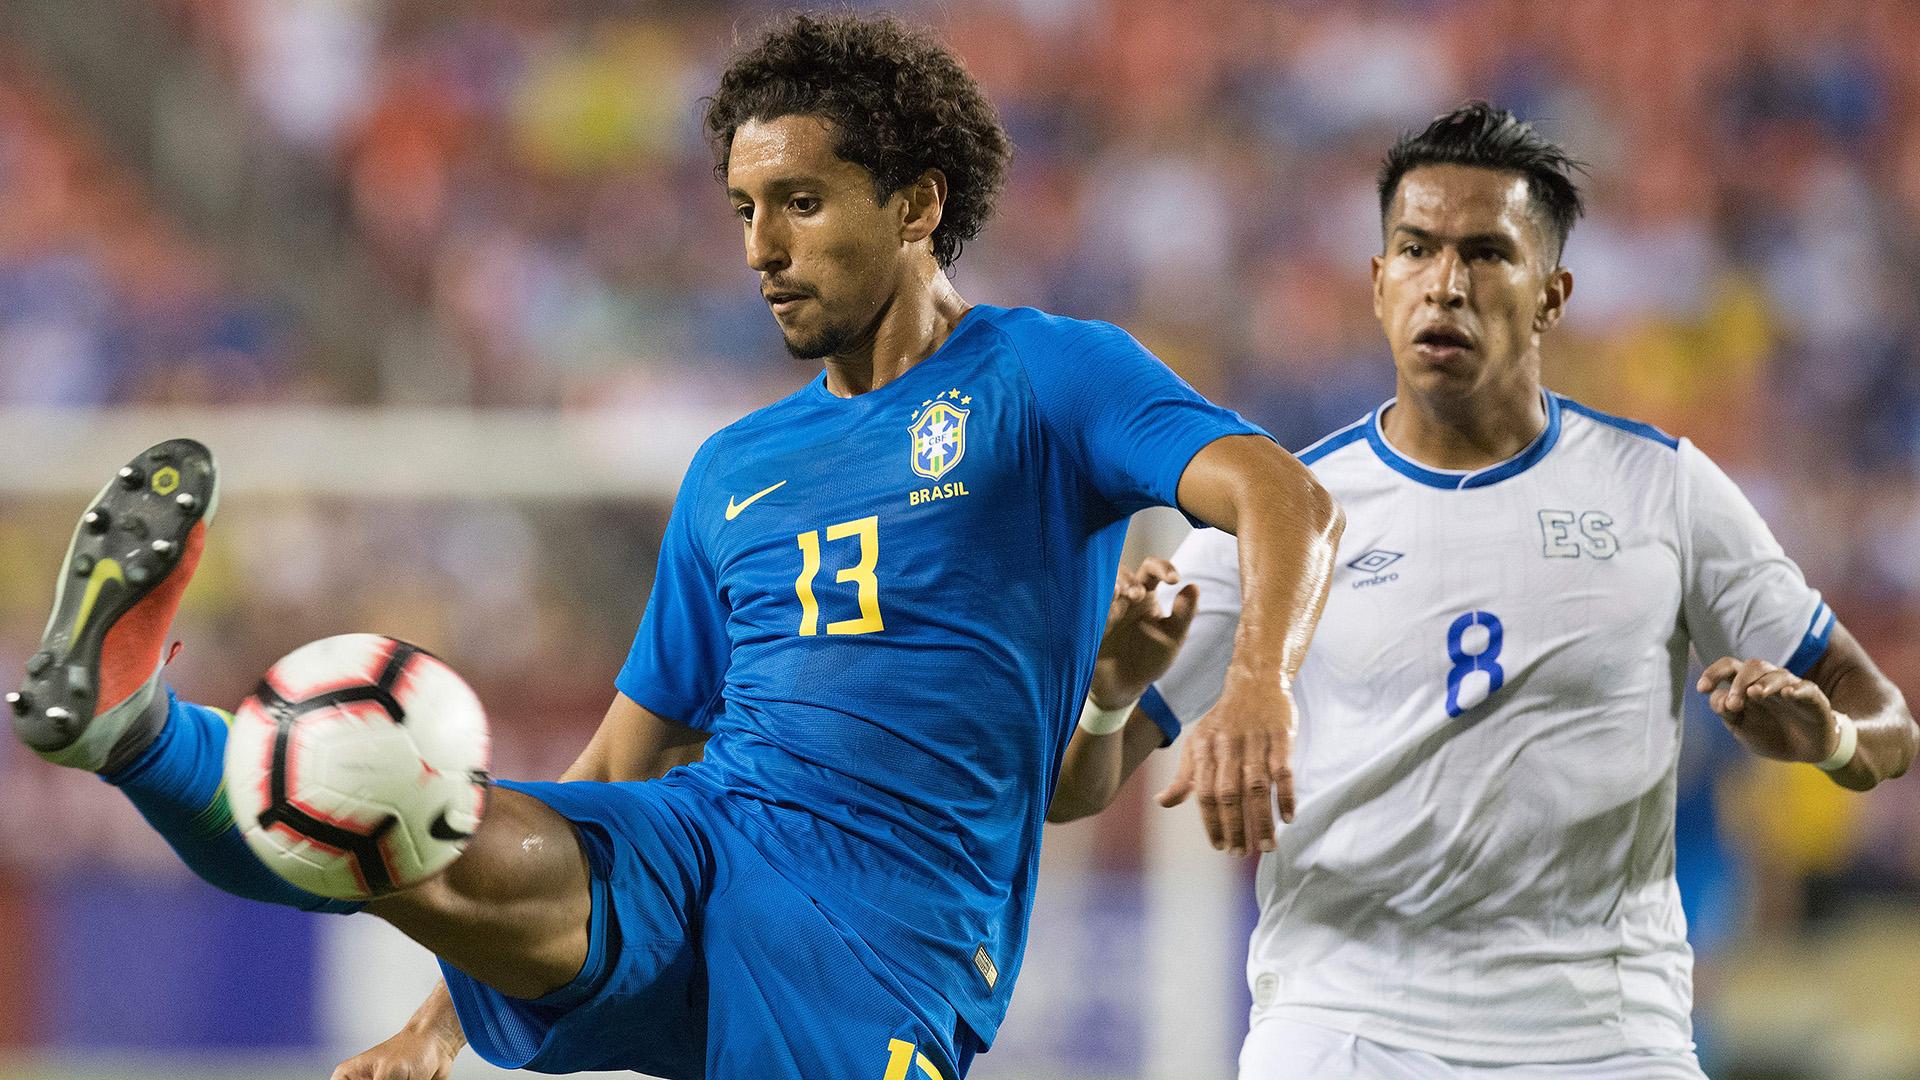 Marquinhos Brazil El Salvador Friendly 11092018